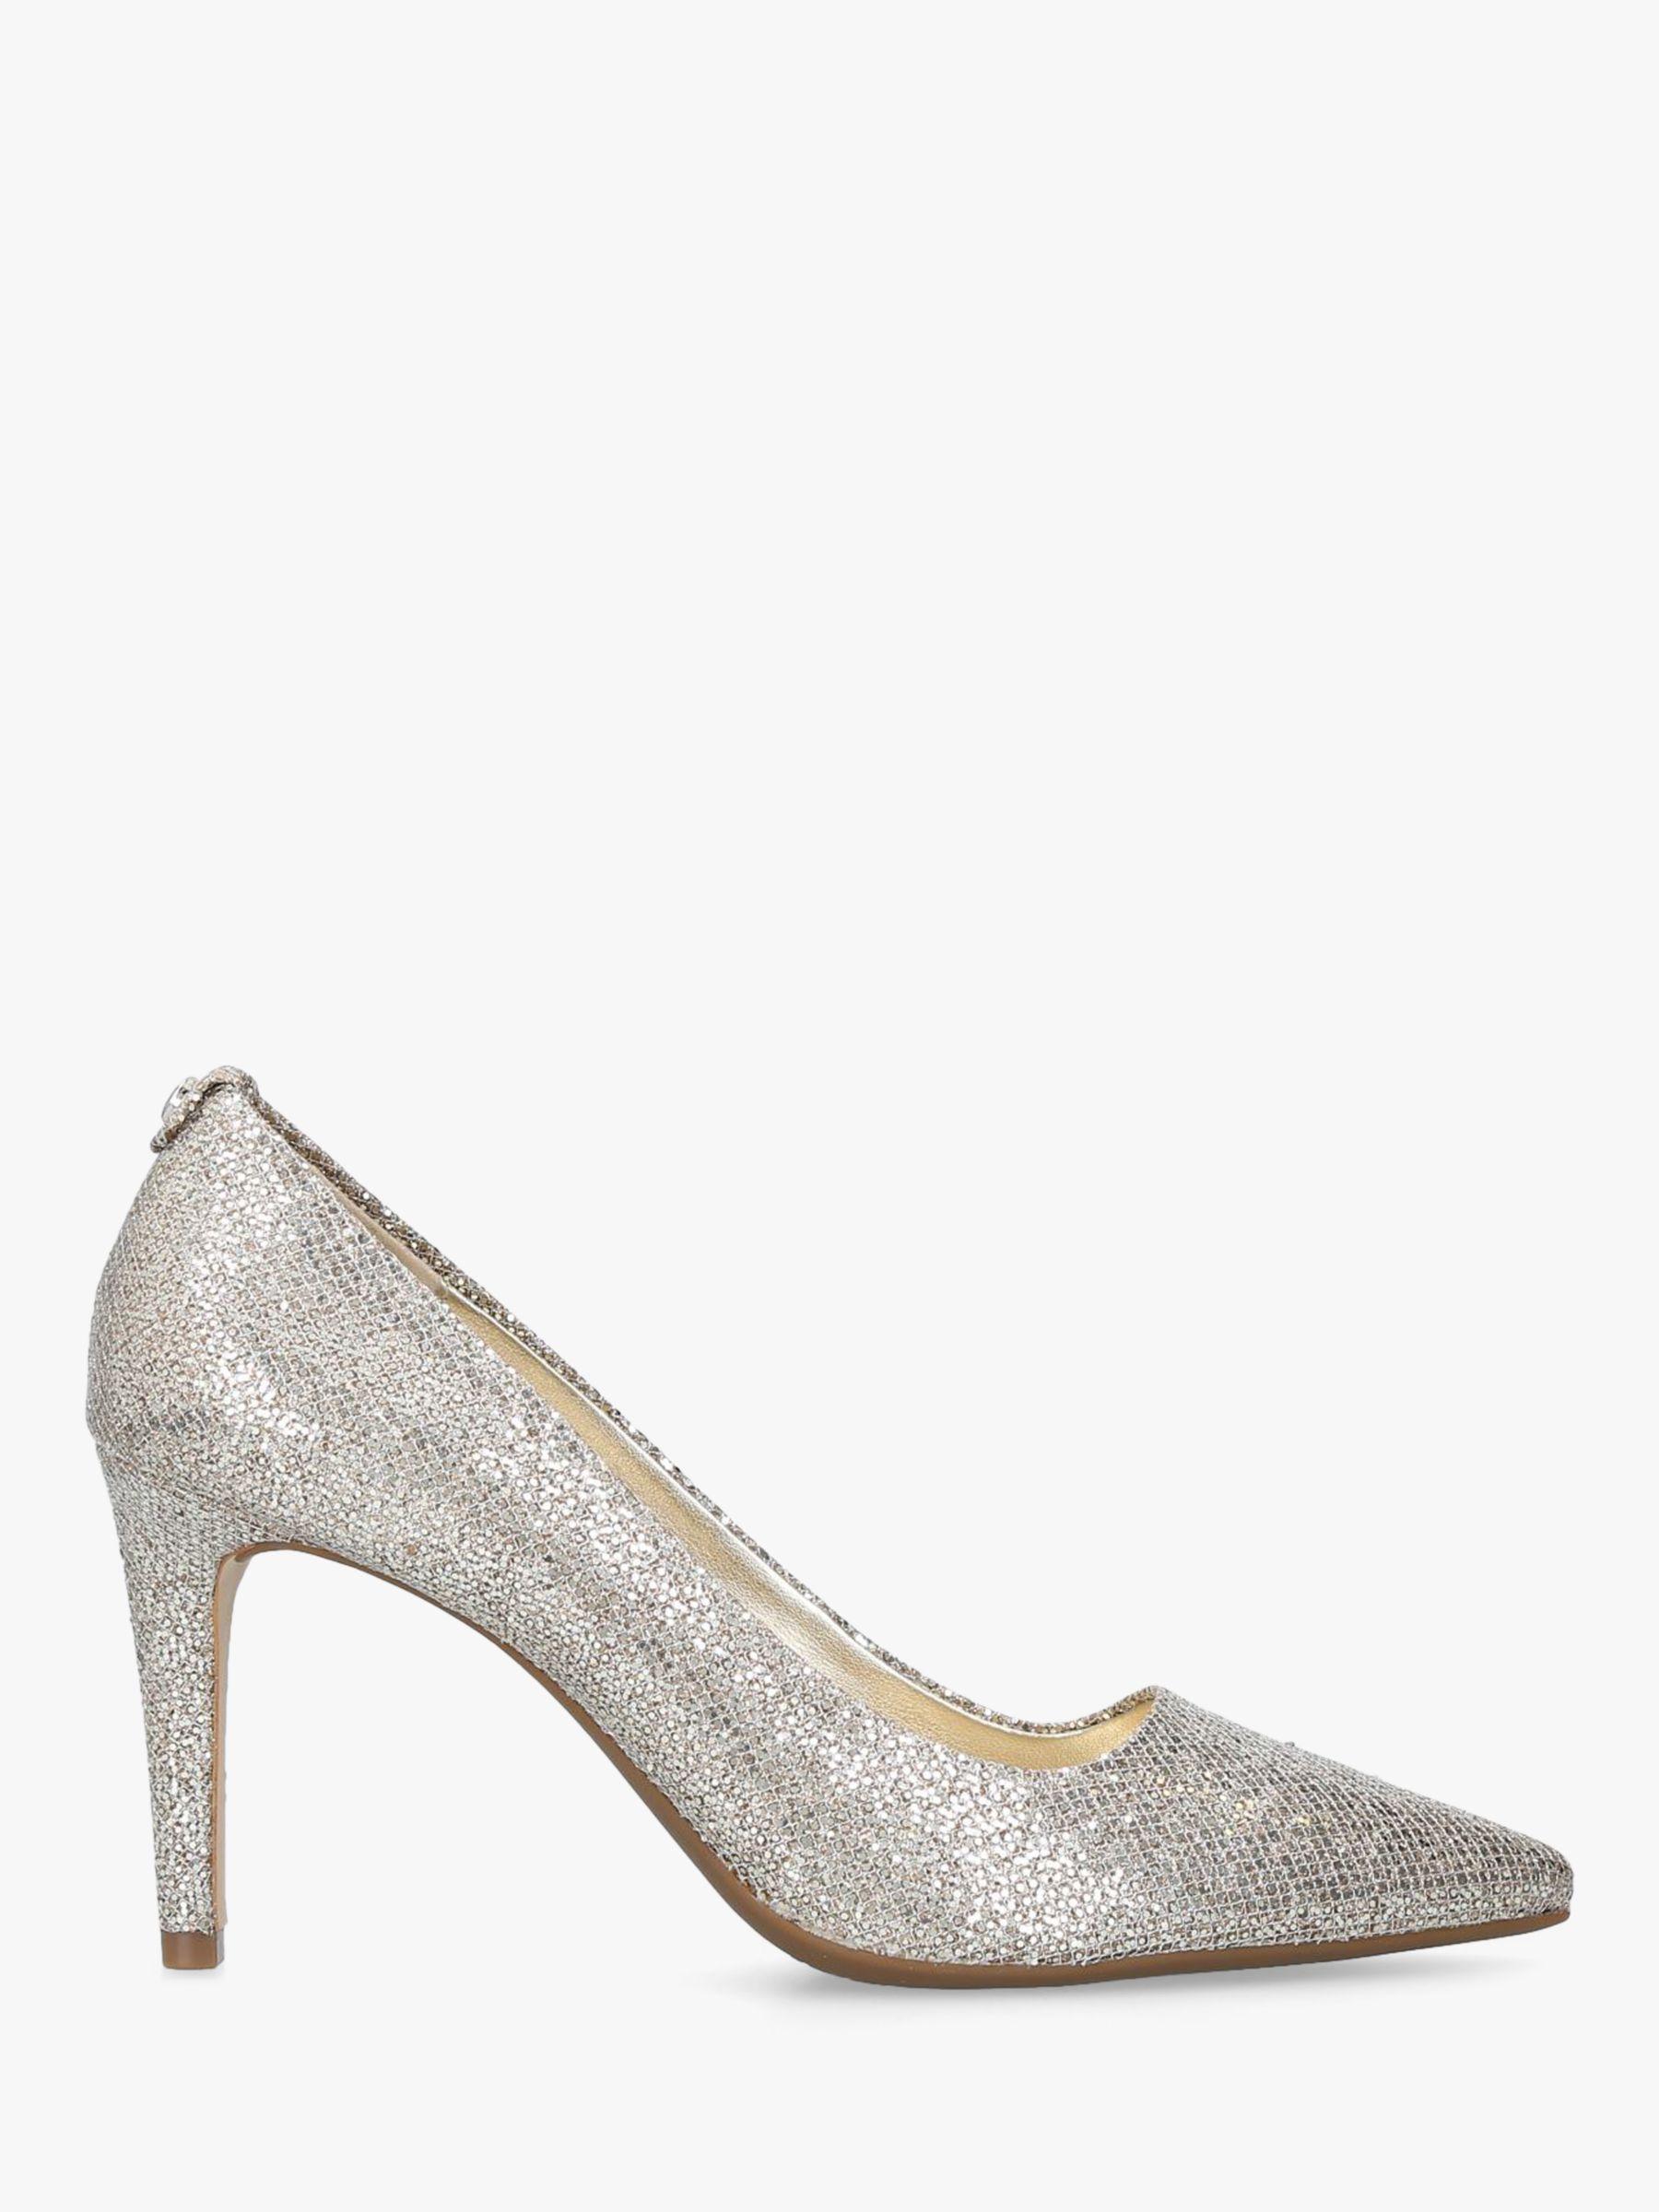 ed06c159c92 Michael Kors Michael Dorothy Flex Pointed Court Shoes in Metallic - Lyst